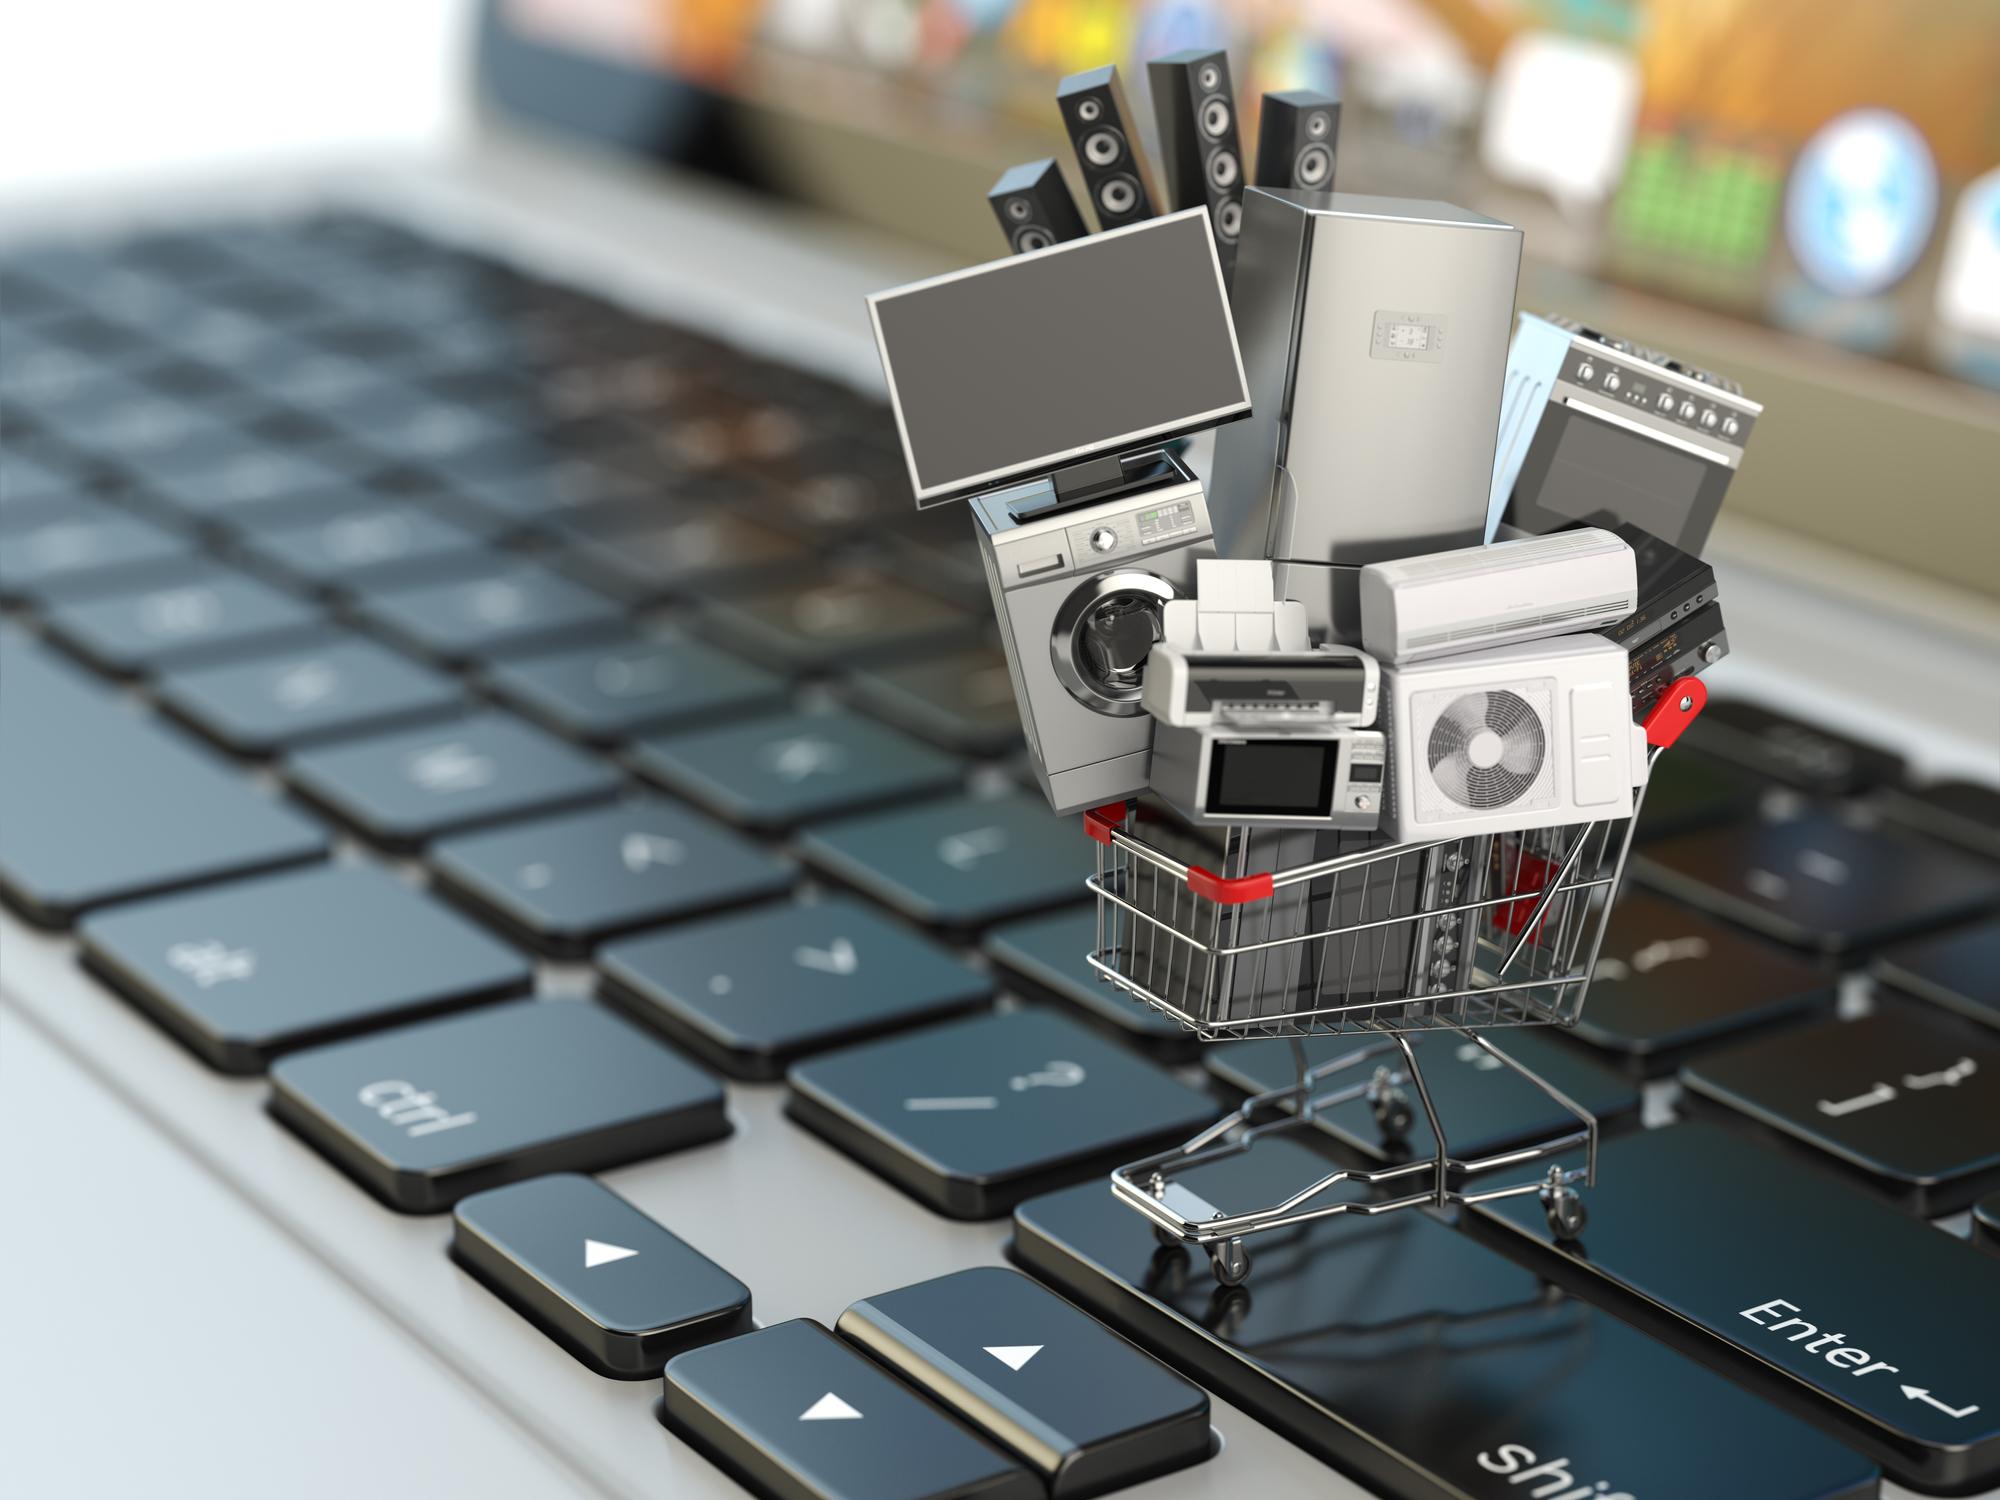 Miniature shopping cart full of electronics on a keyboard